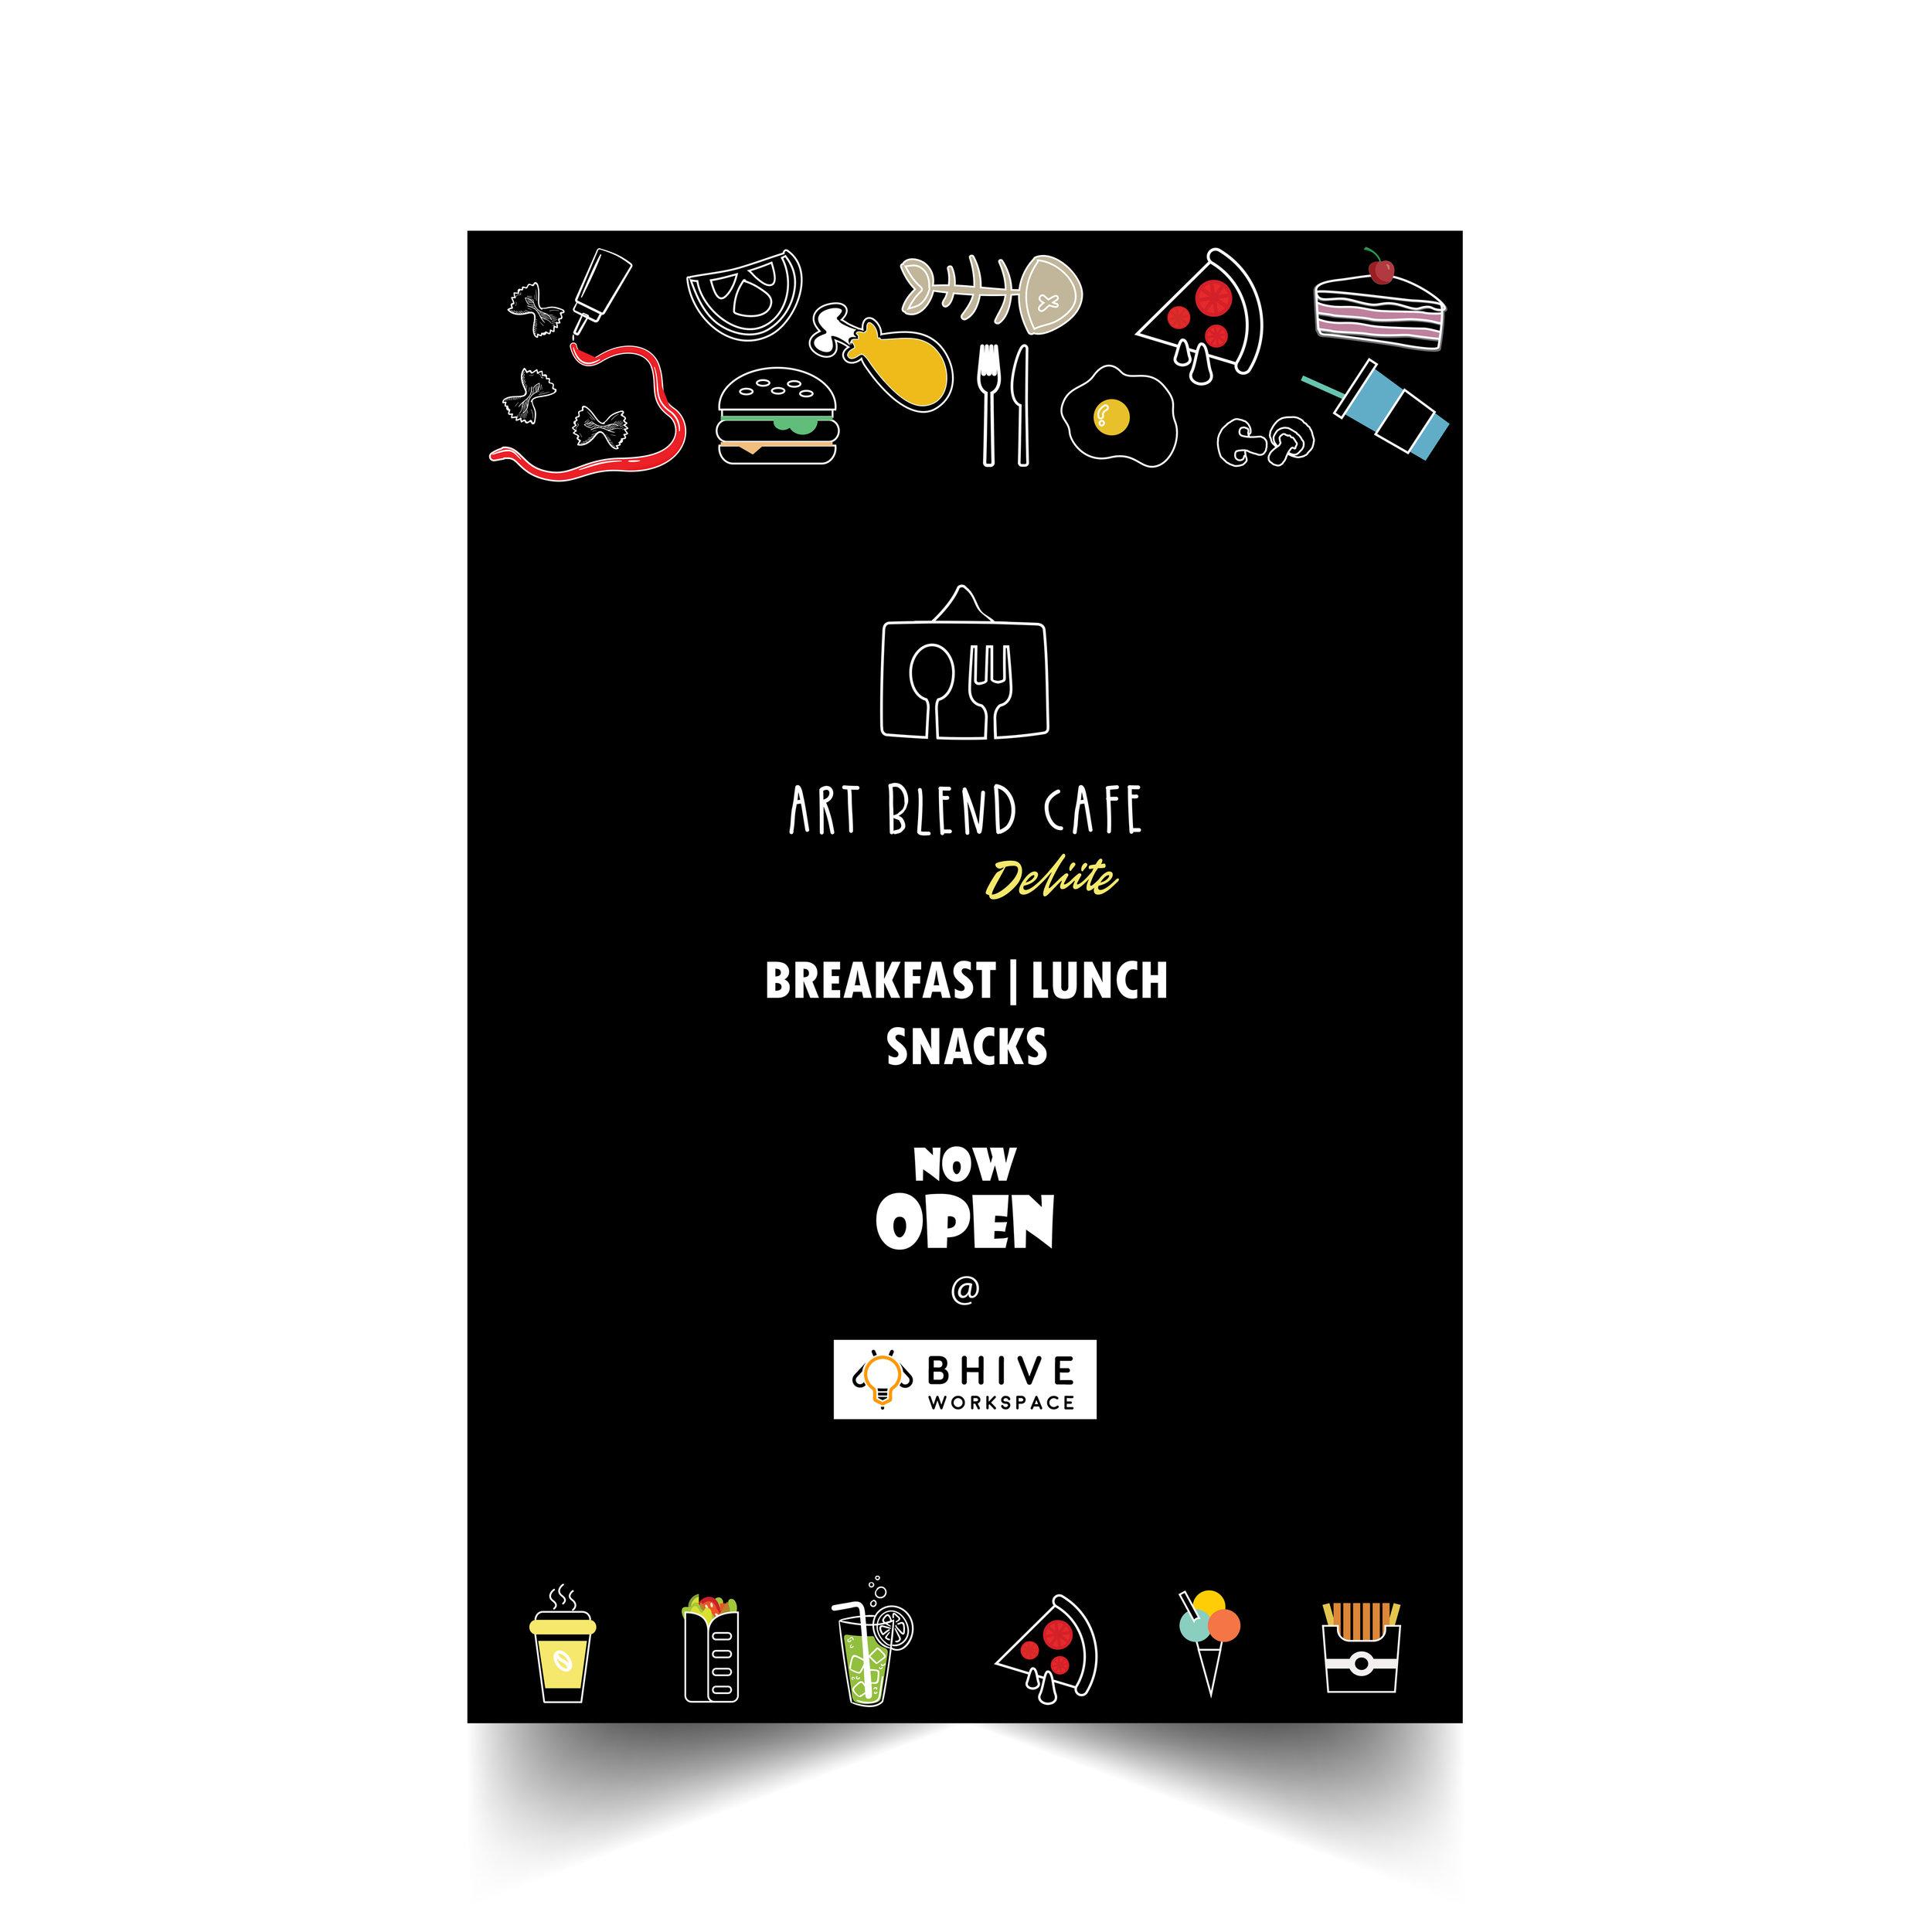 Art Blend Cafe Deliite Poster Design.jpg